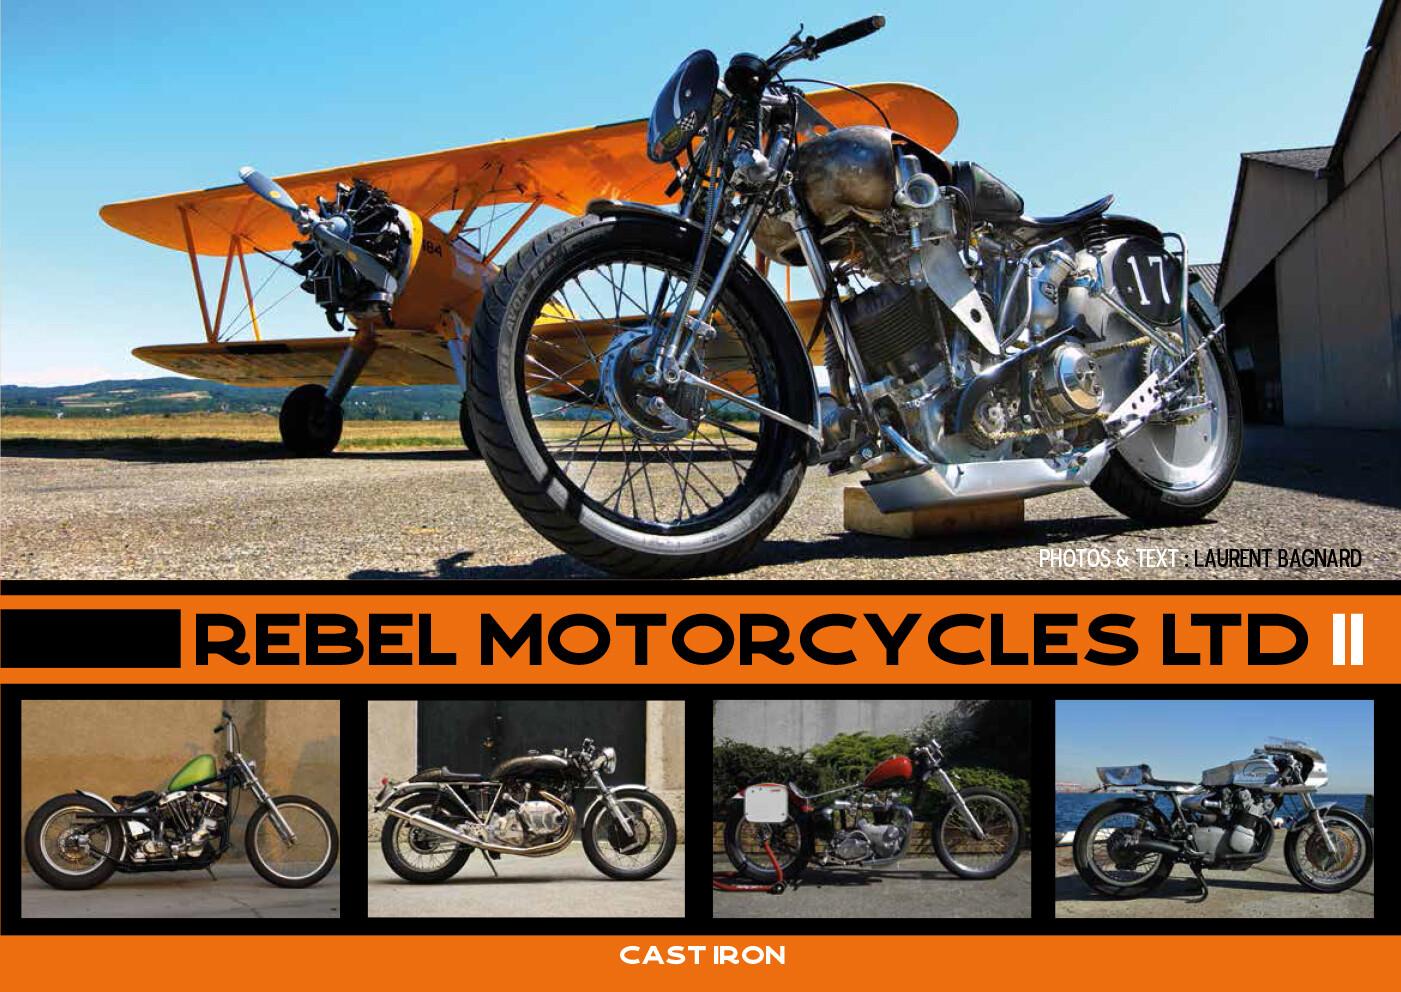 Rebel Motorcycles Ltd. II